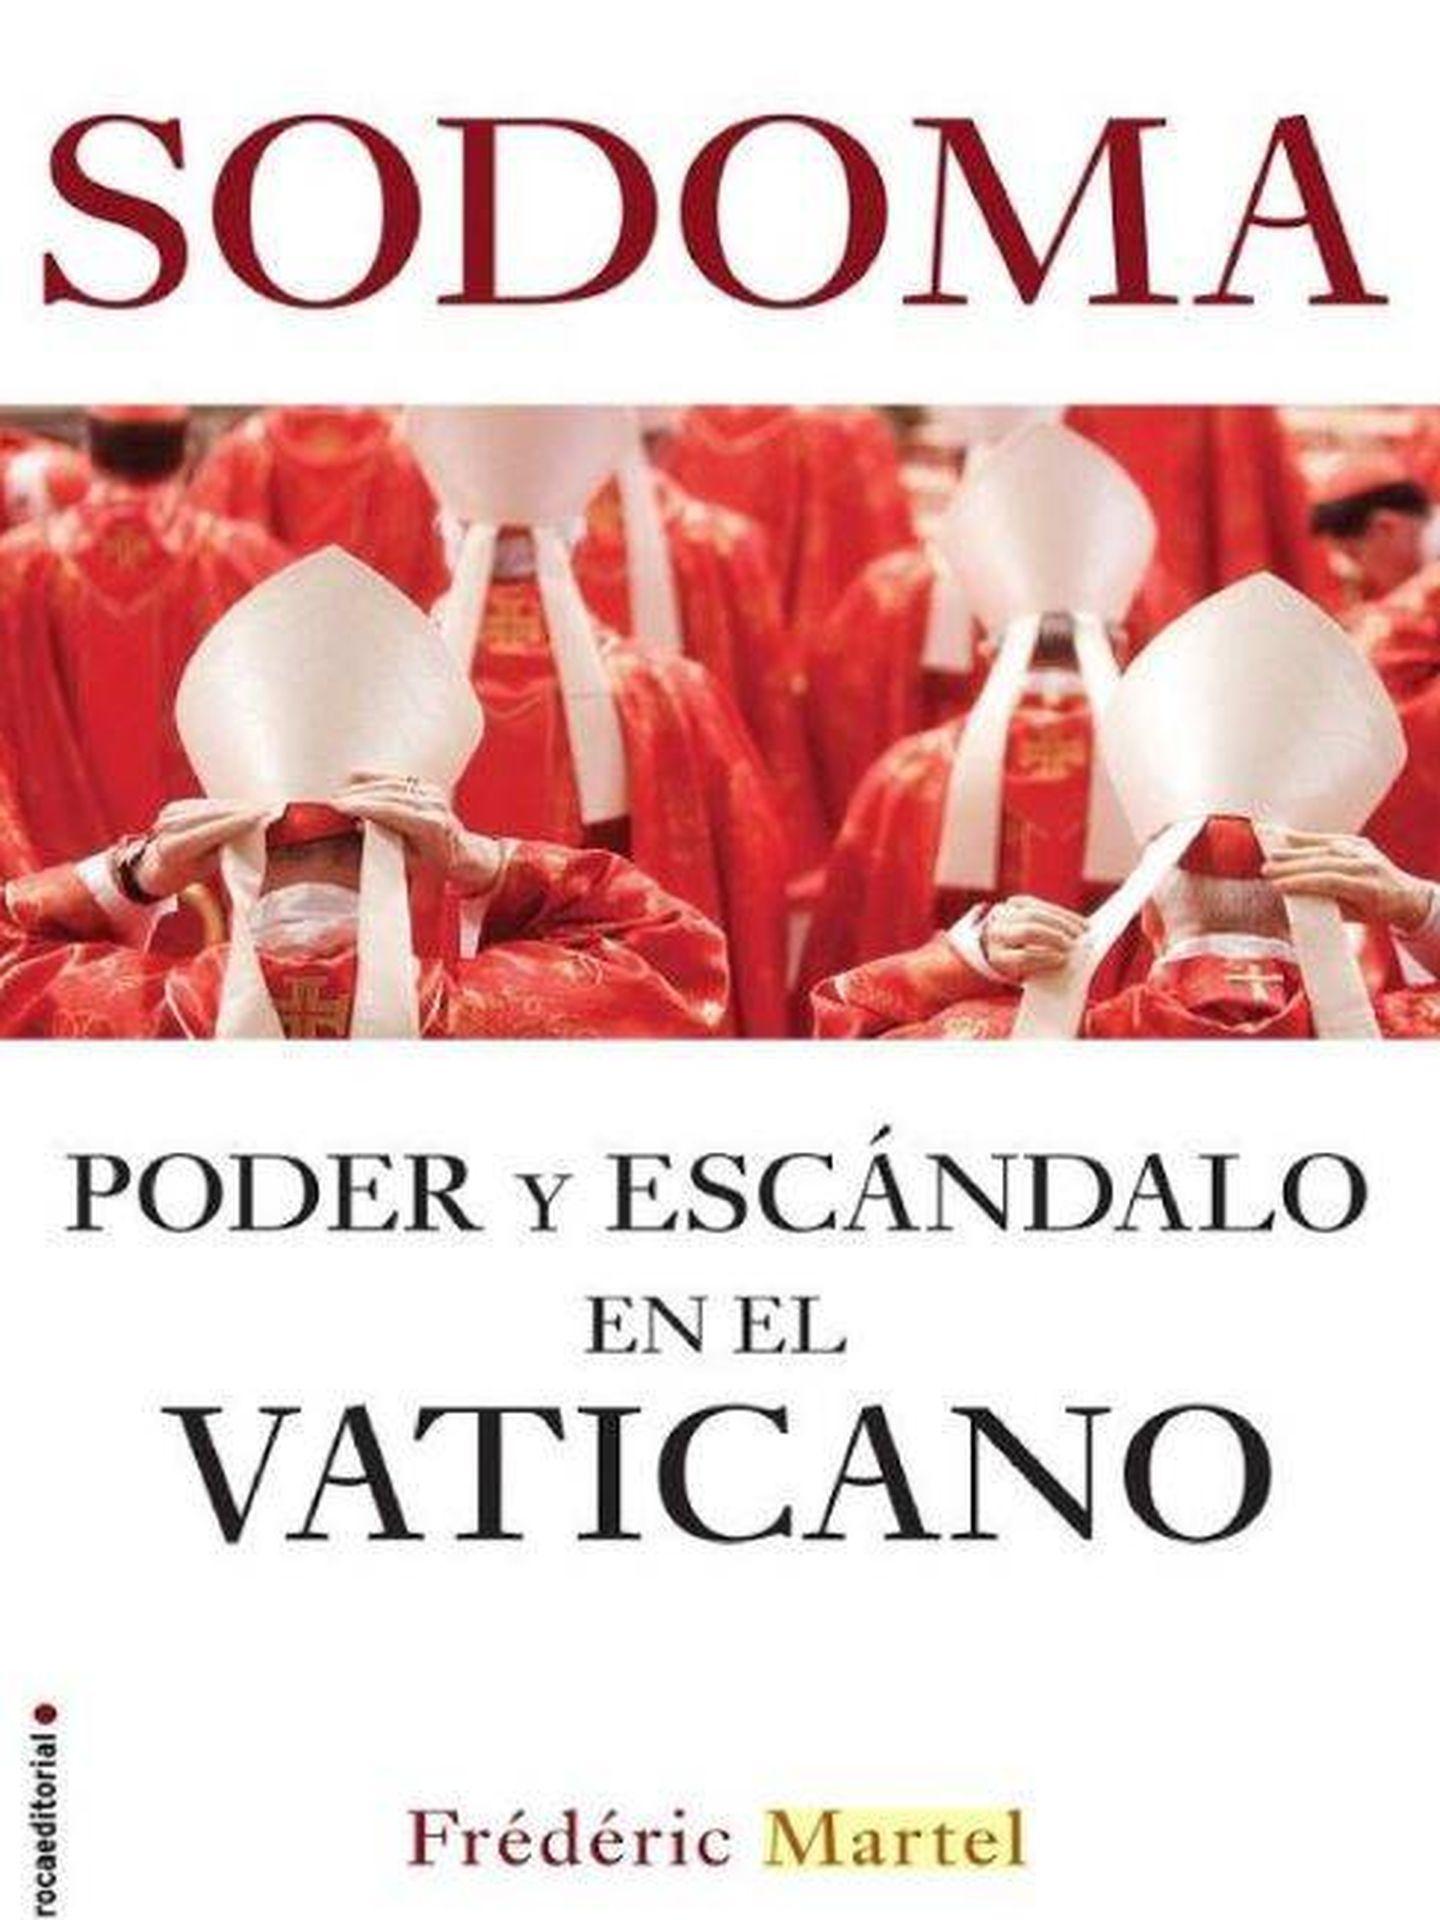 Portada de la edición latina de Sodoma.